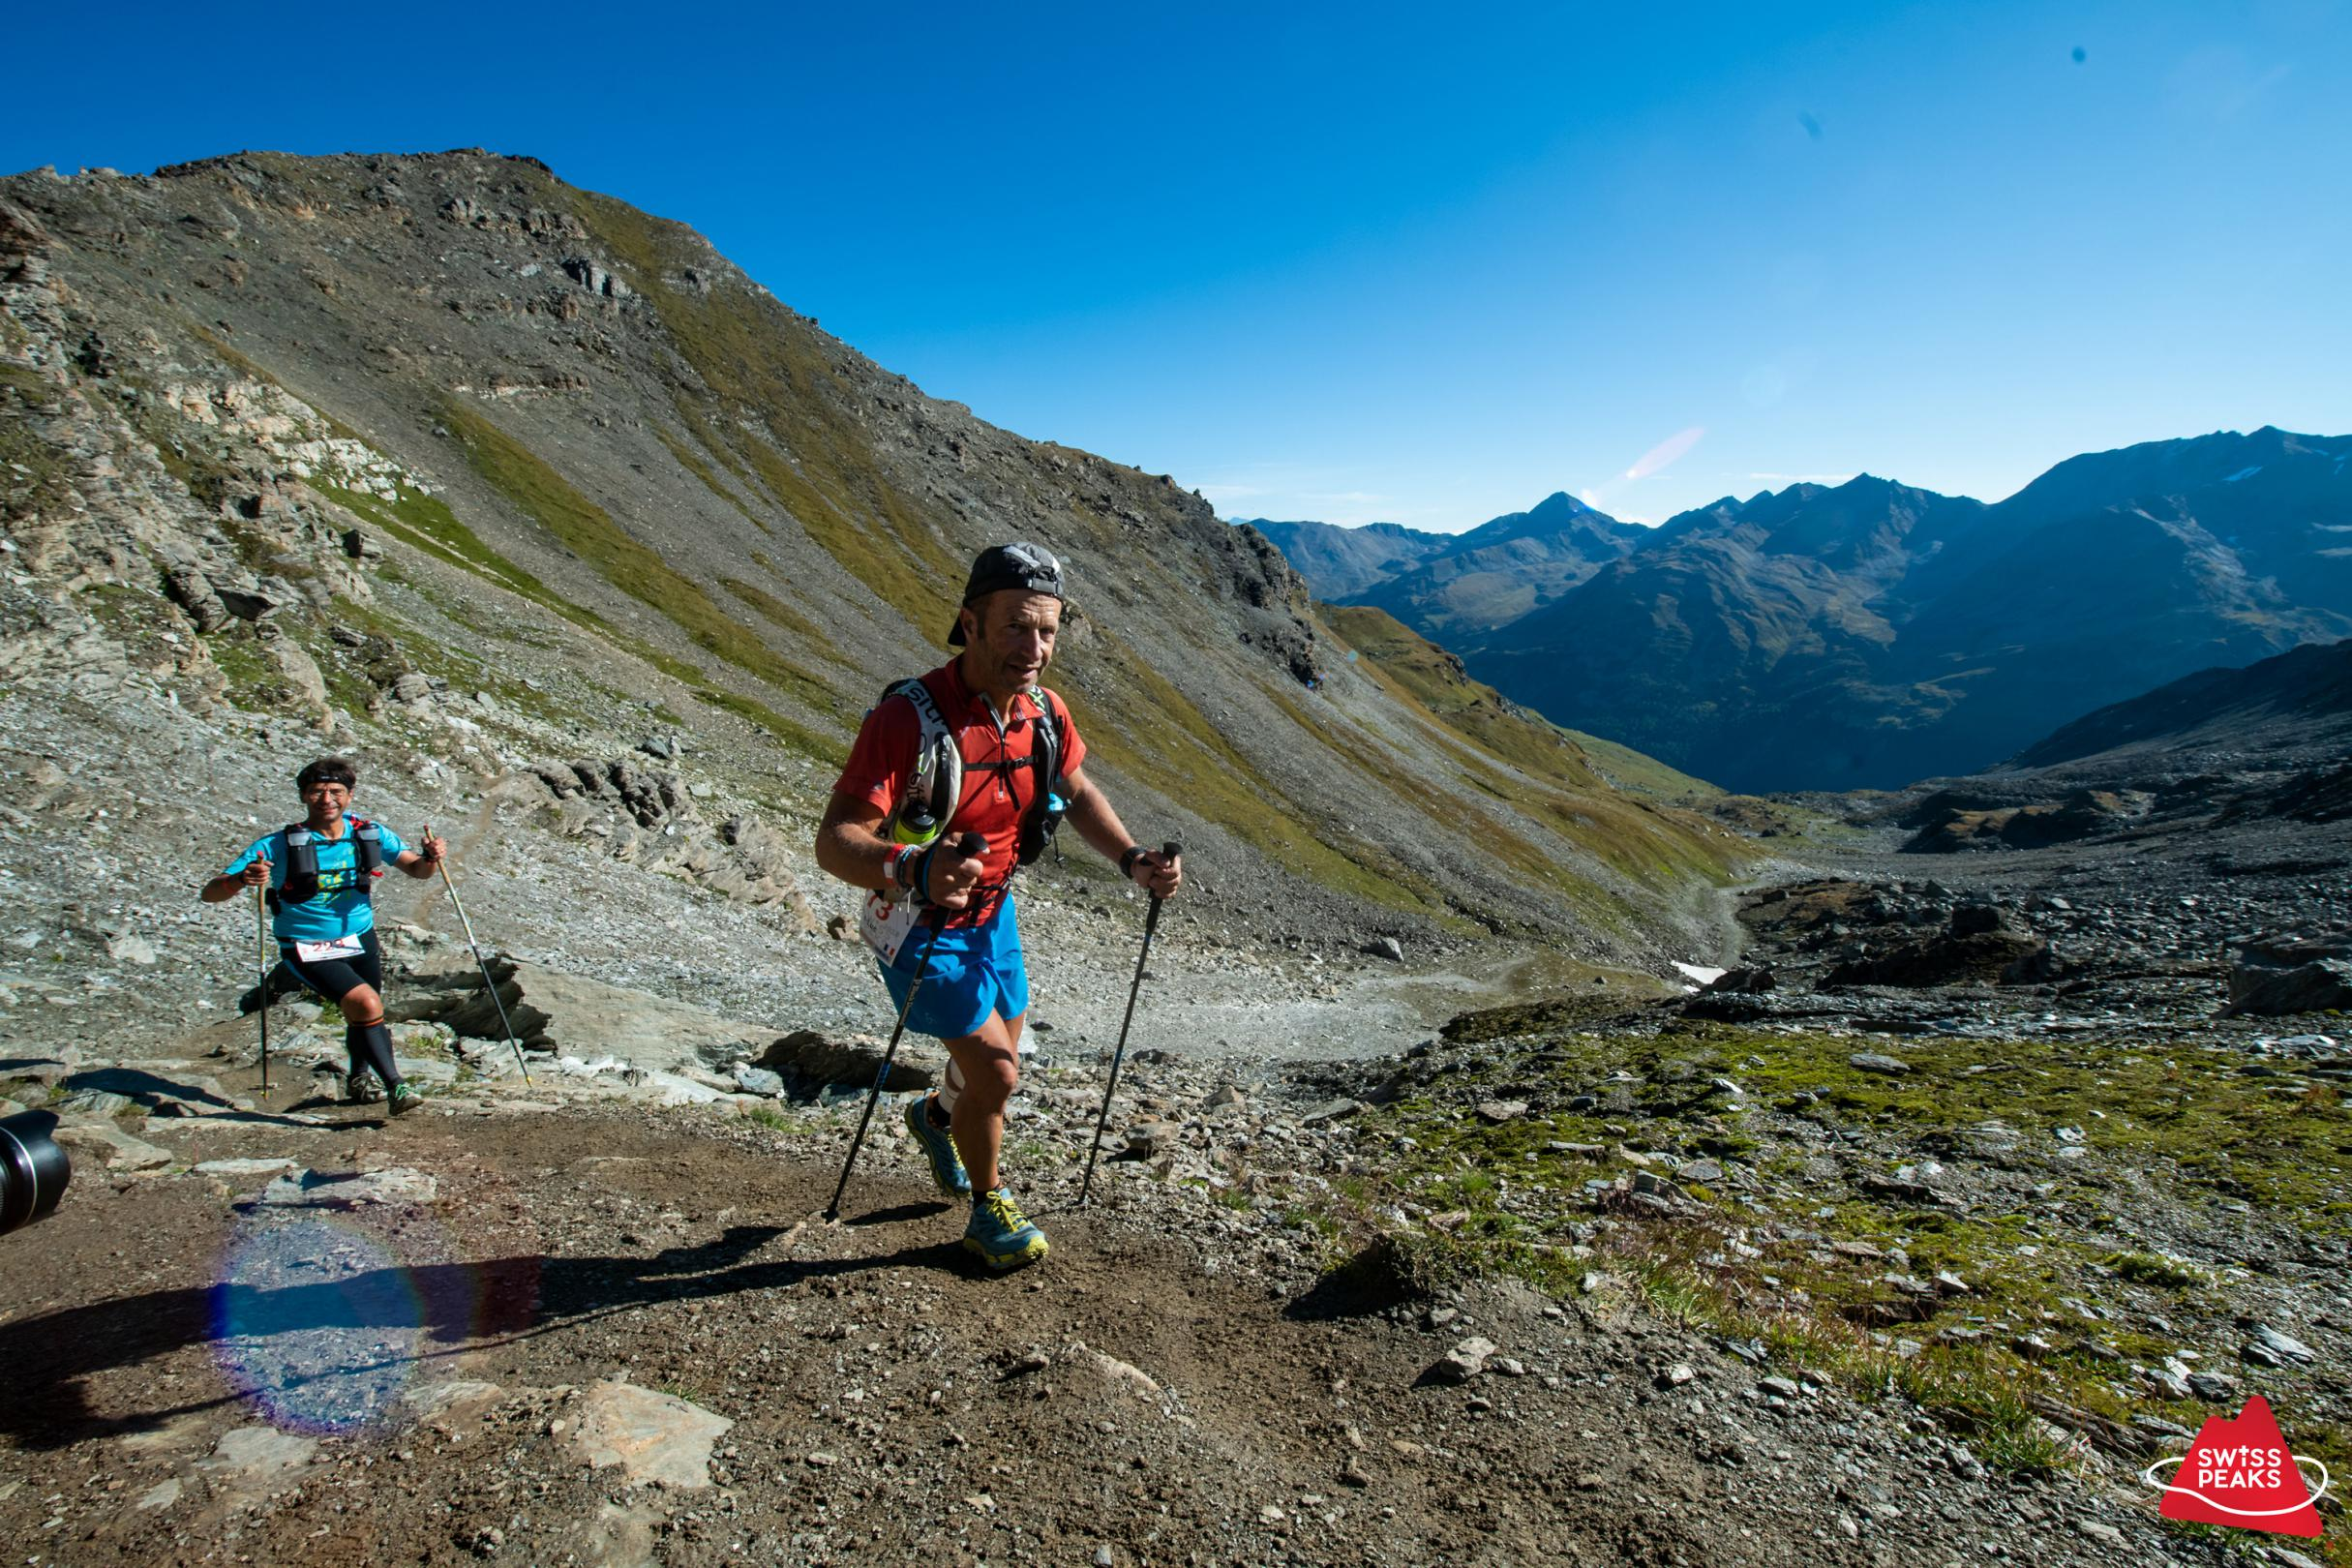 SwissPeaks Trail_Coureurs montant.jpg